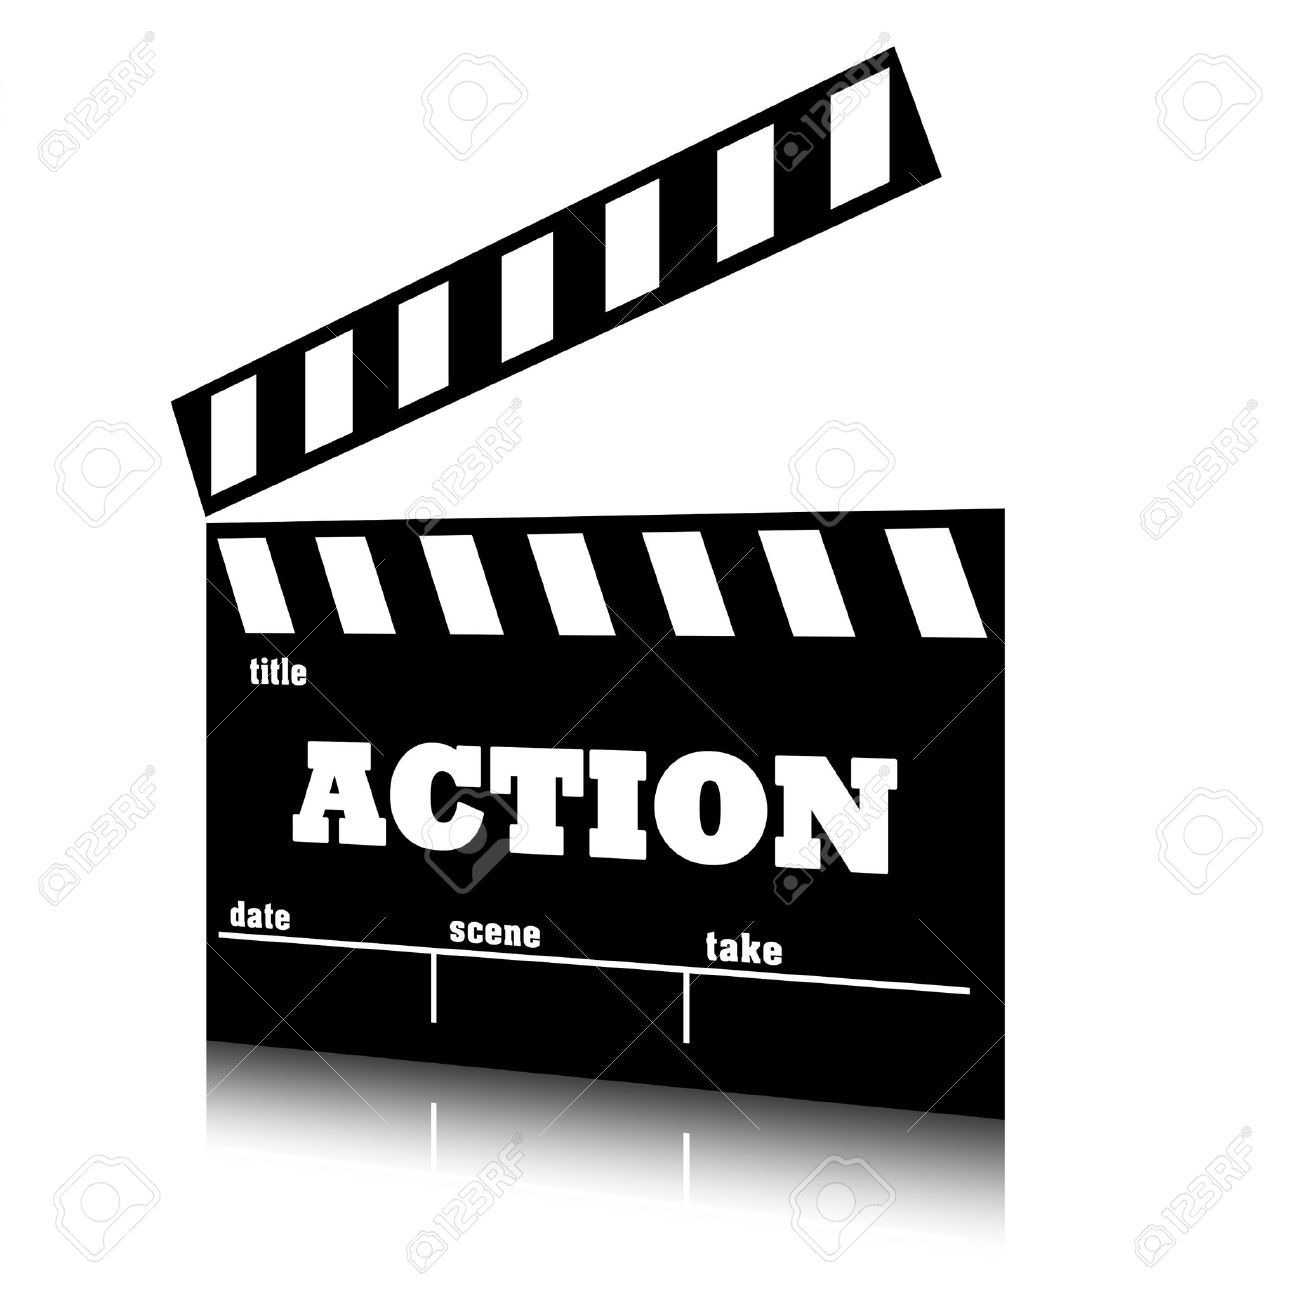 Clap film of cinema action genre, clapperboard text illustration. Stock  Illustration - 16084899